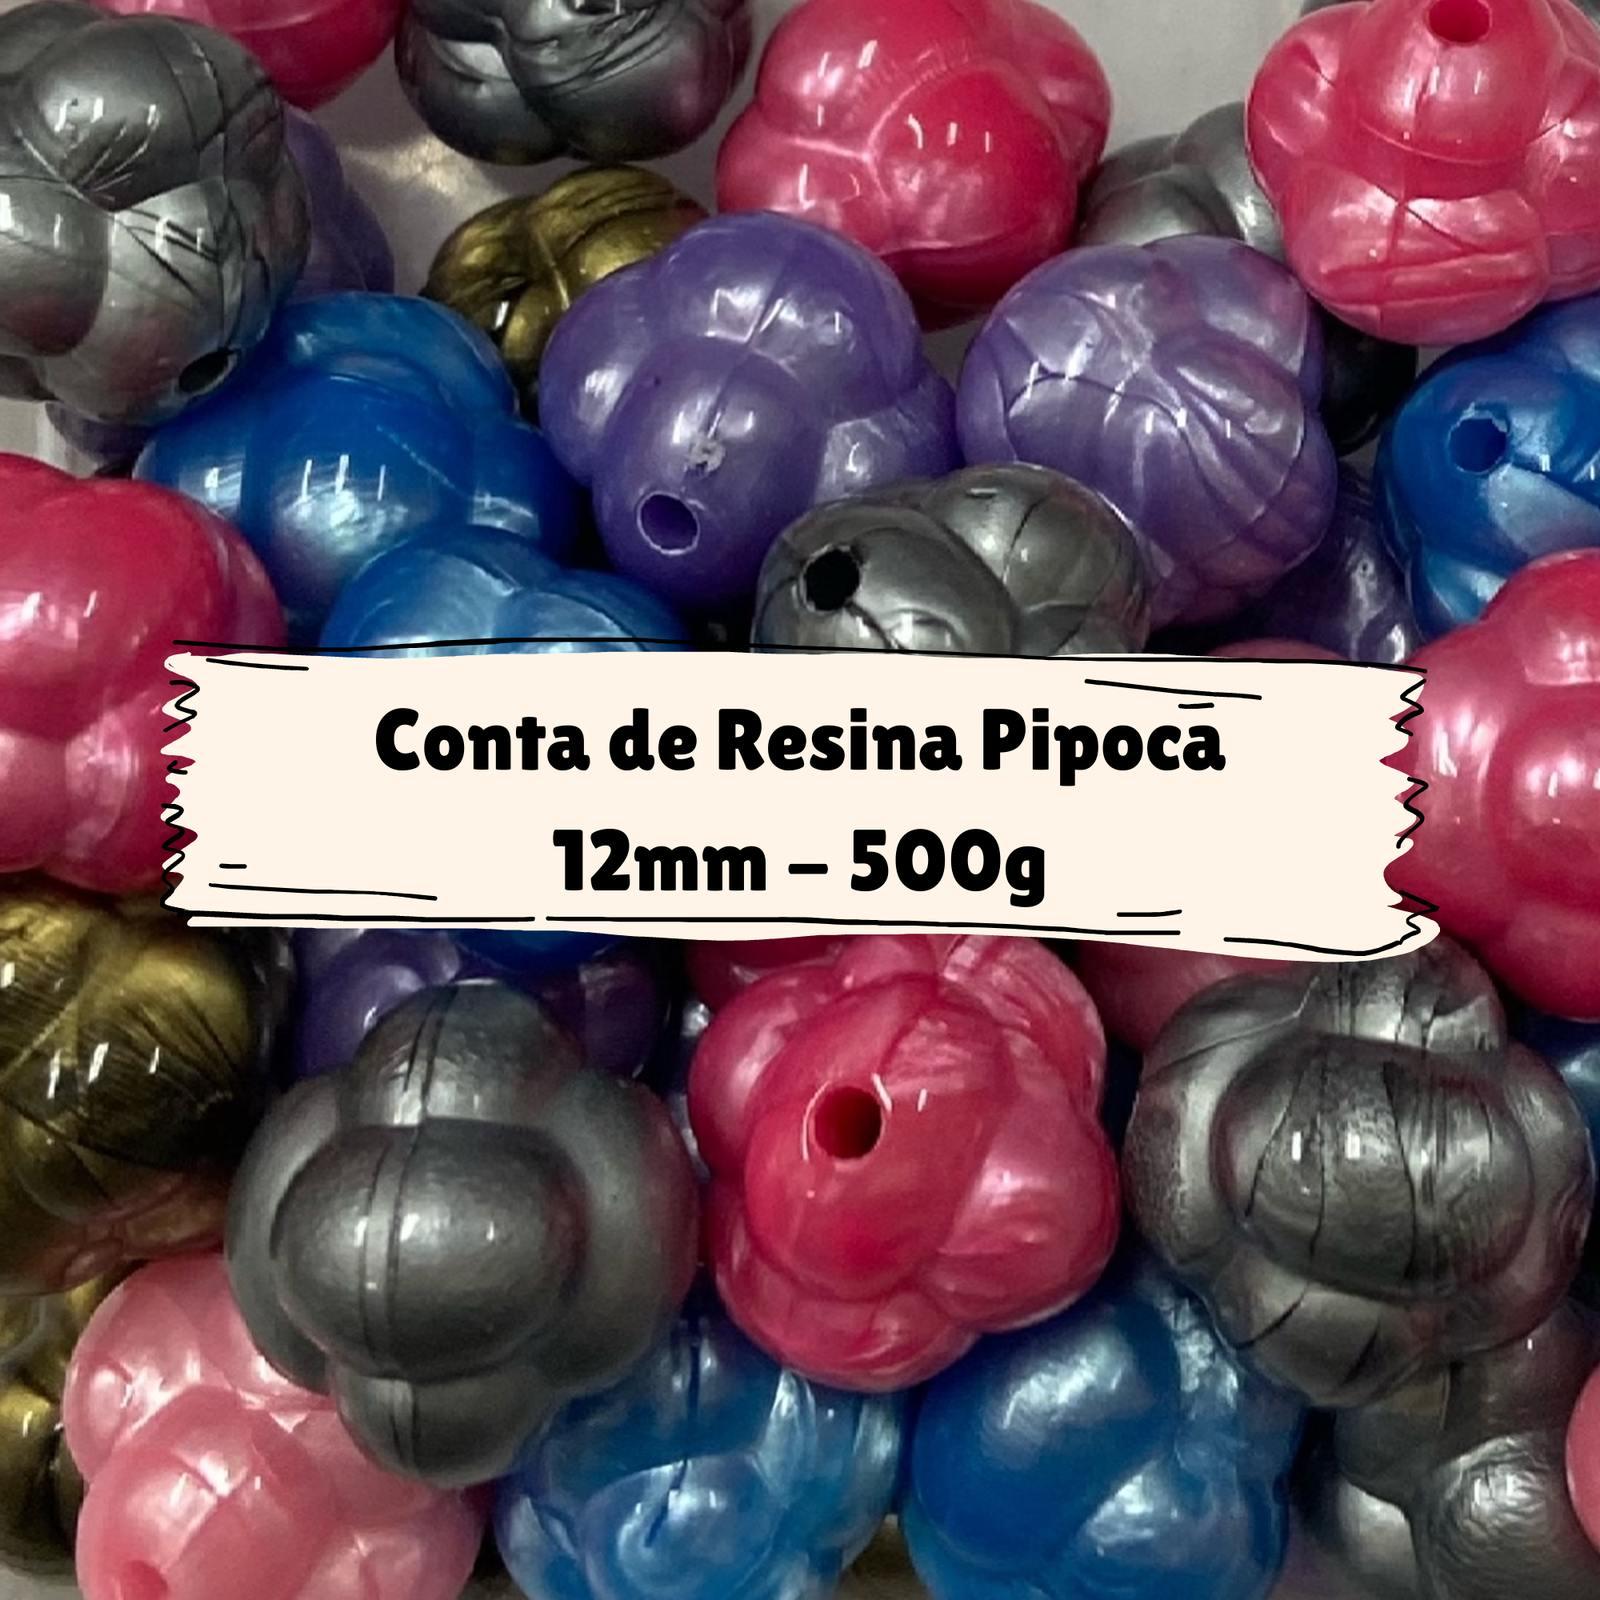 Conta de Resina Pipoca 12mm - 500g